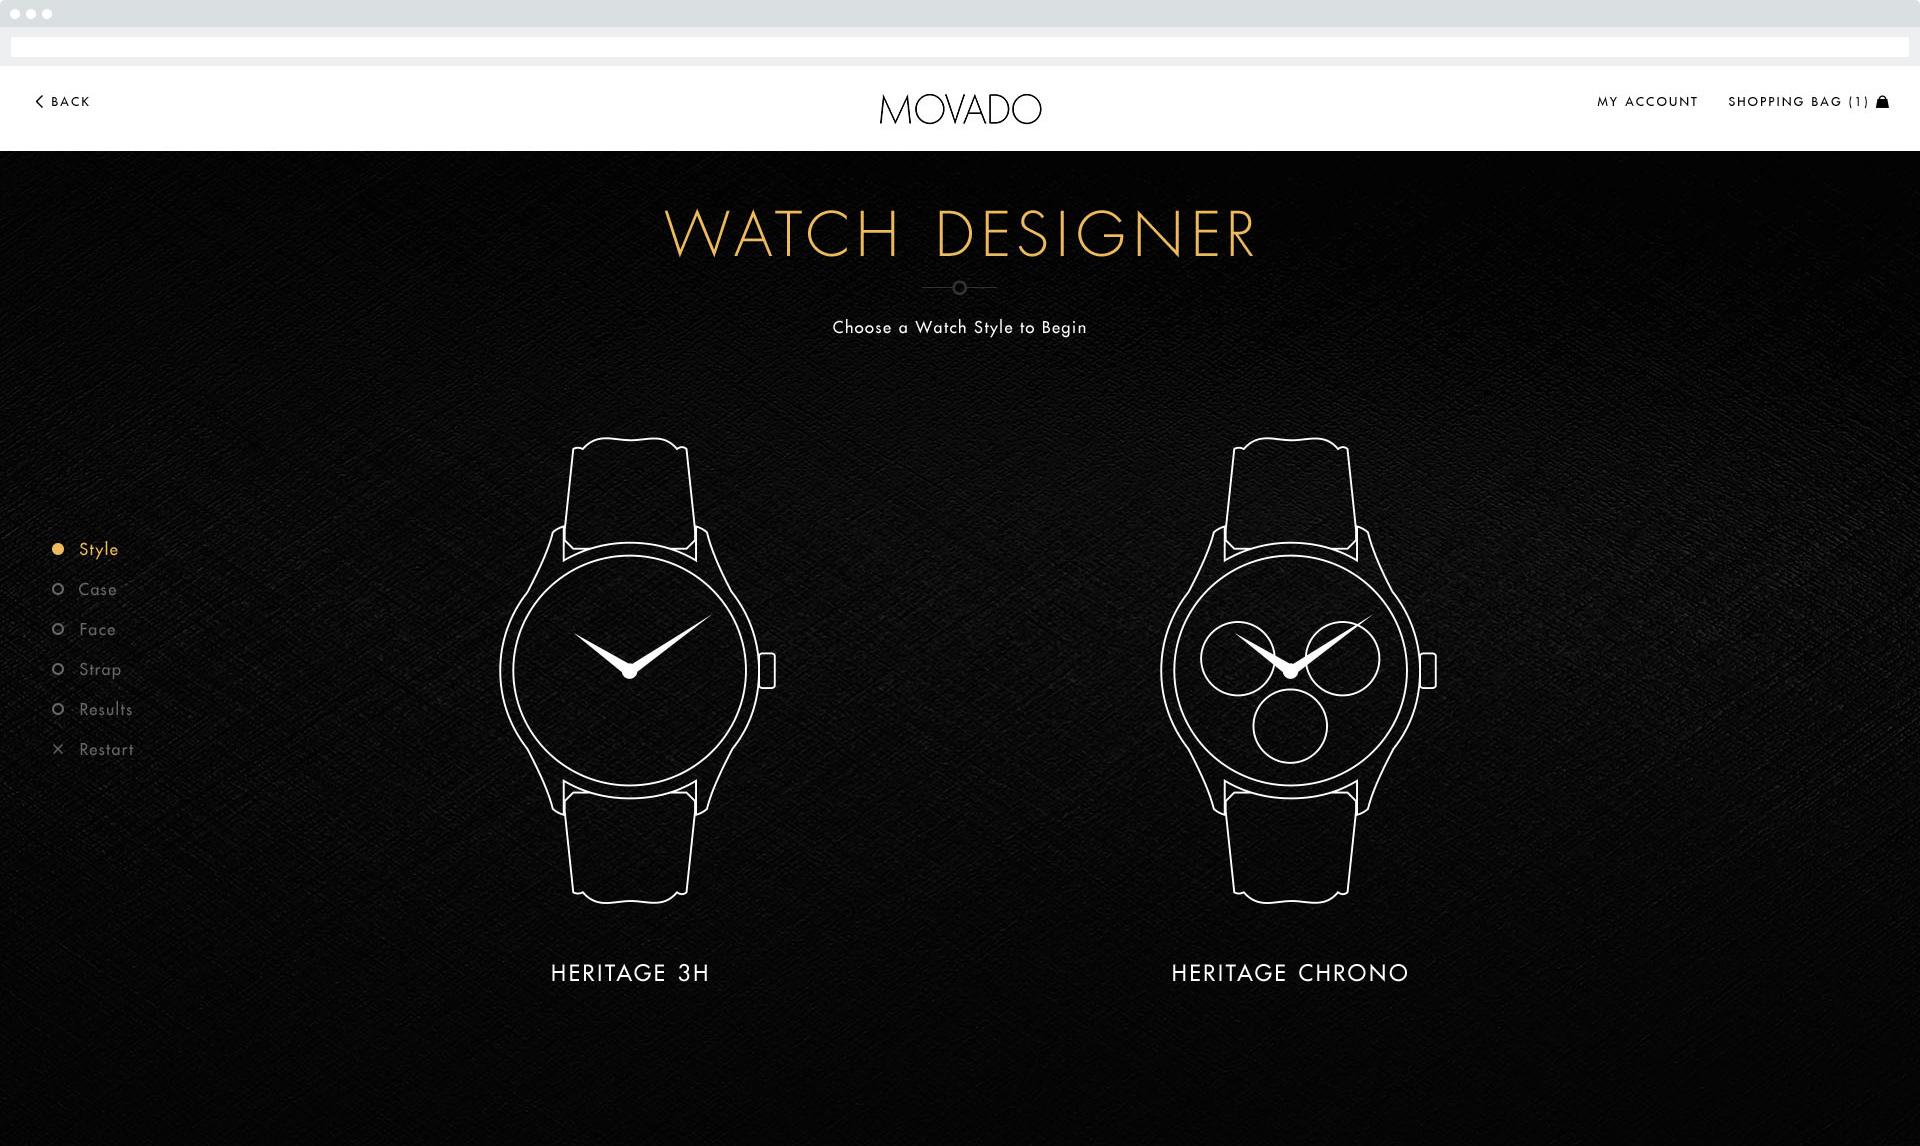 Movado_Desktop_WatchConfigurator_CN_STYLE_for_web.jpg